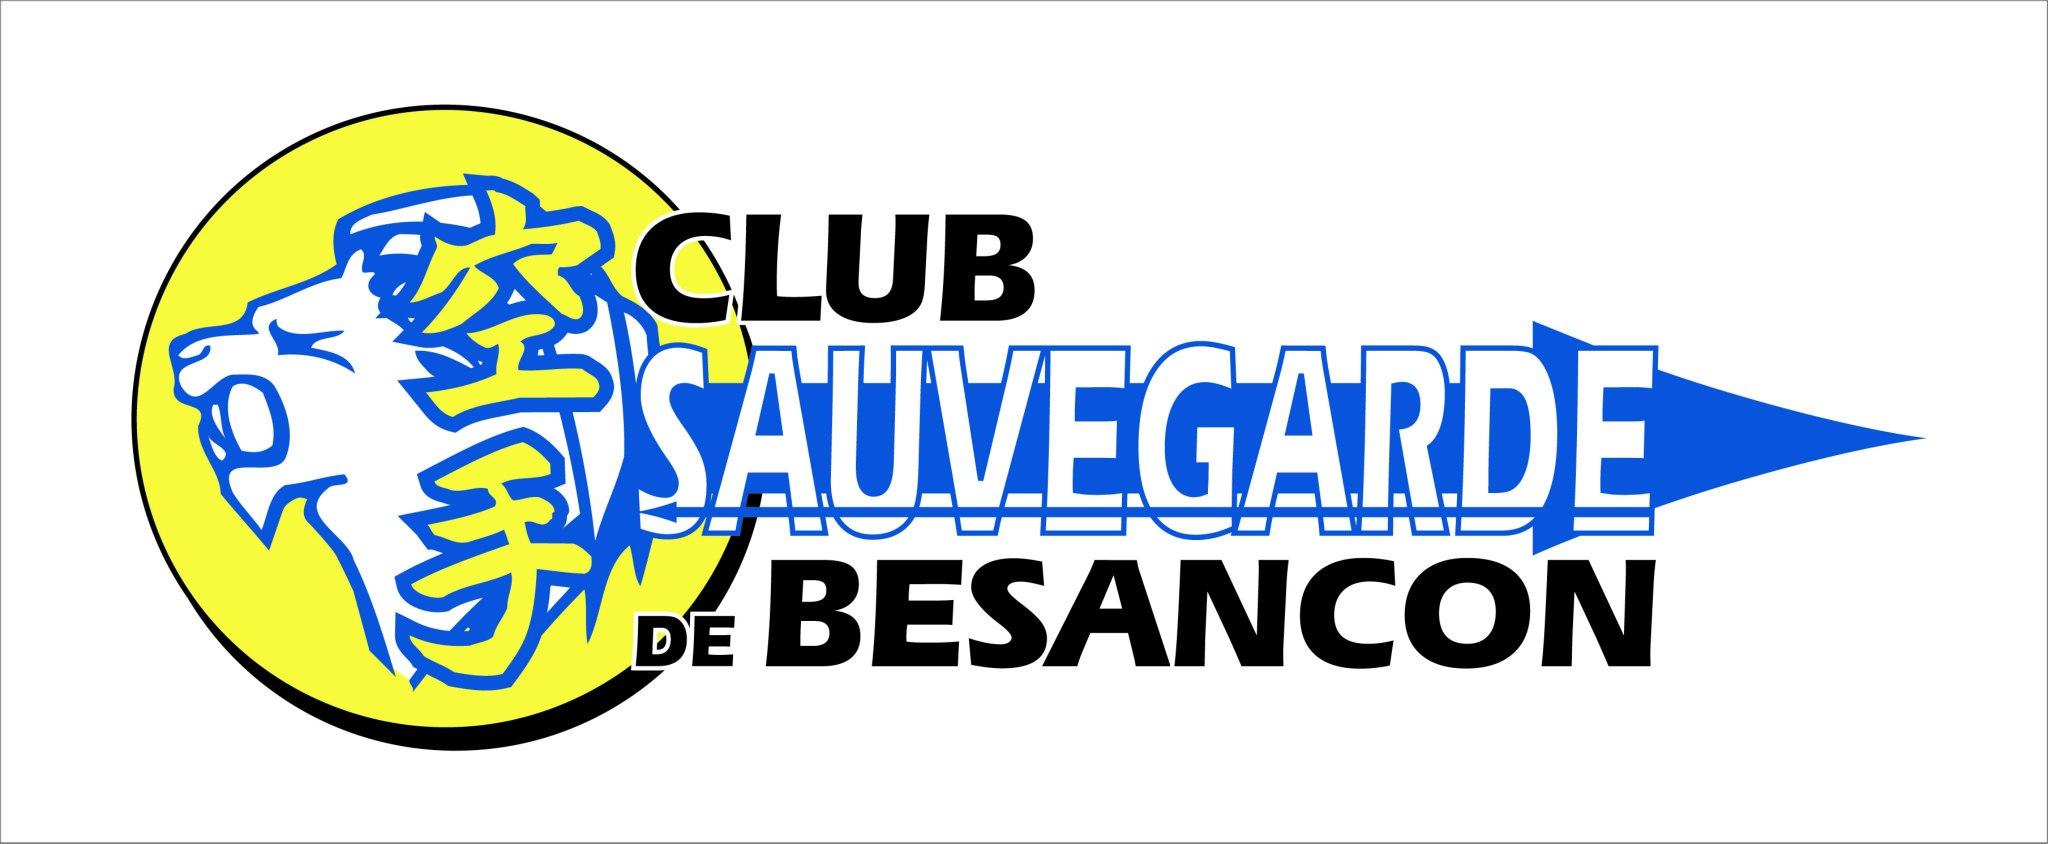 http://planoisactive.fr/wp-content/uploads/2017/03/logo-sauvegarde.jpg